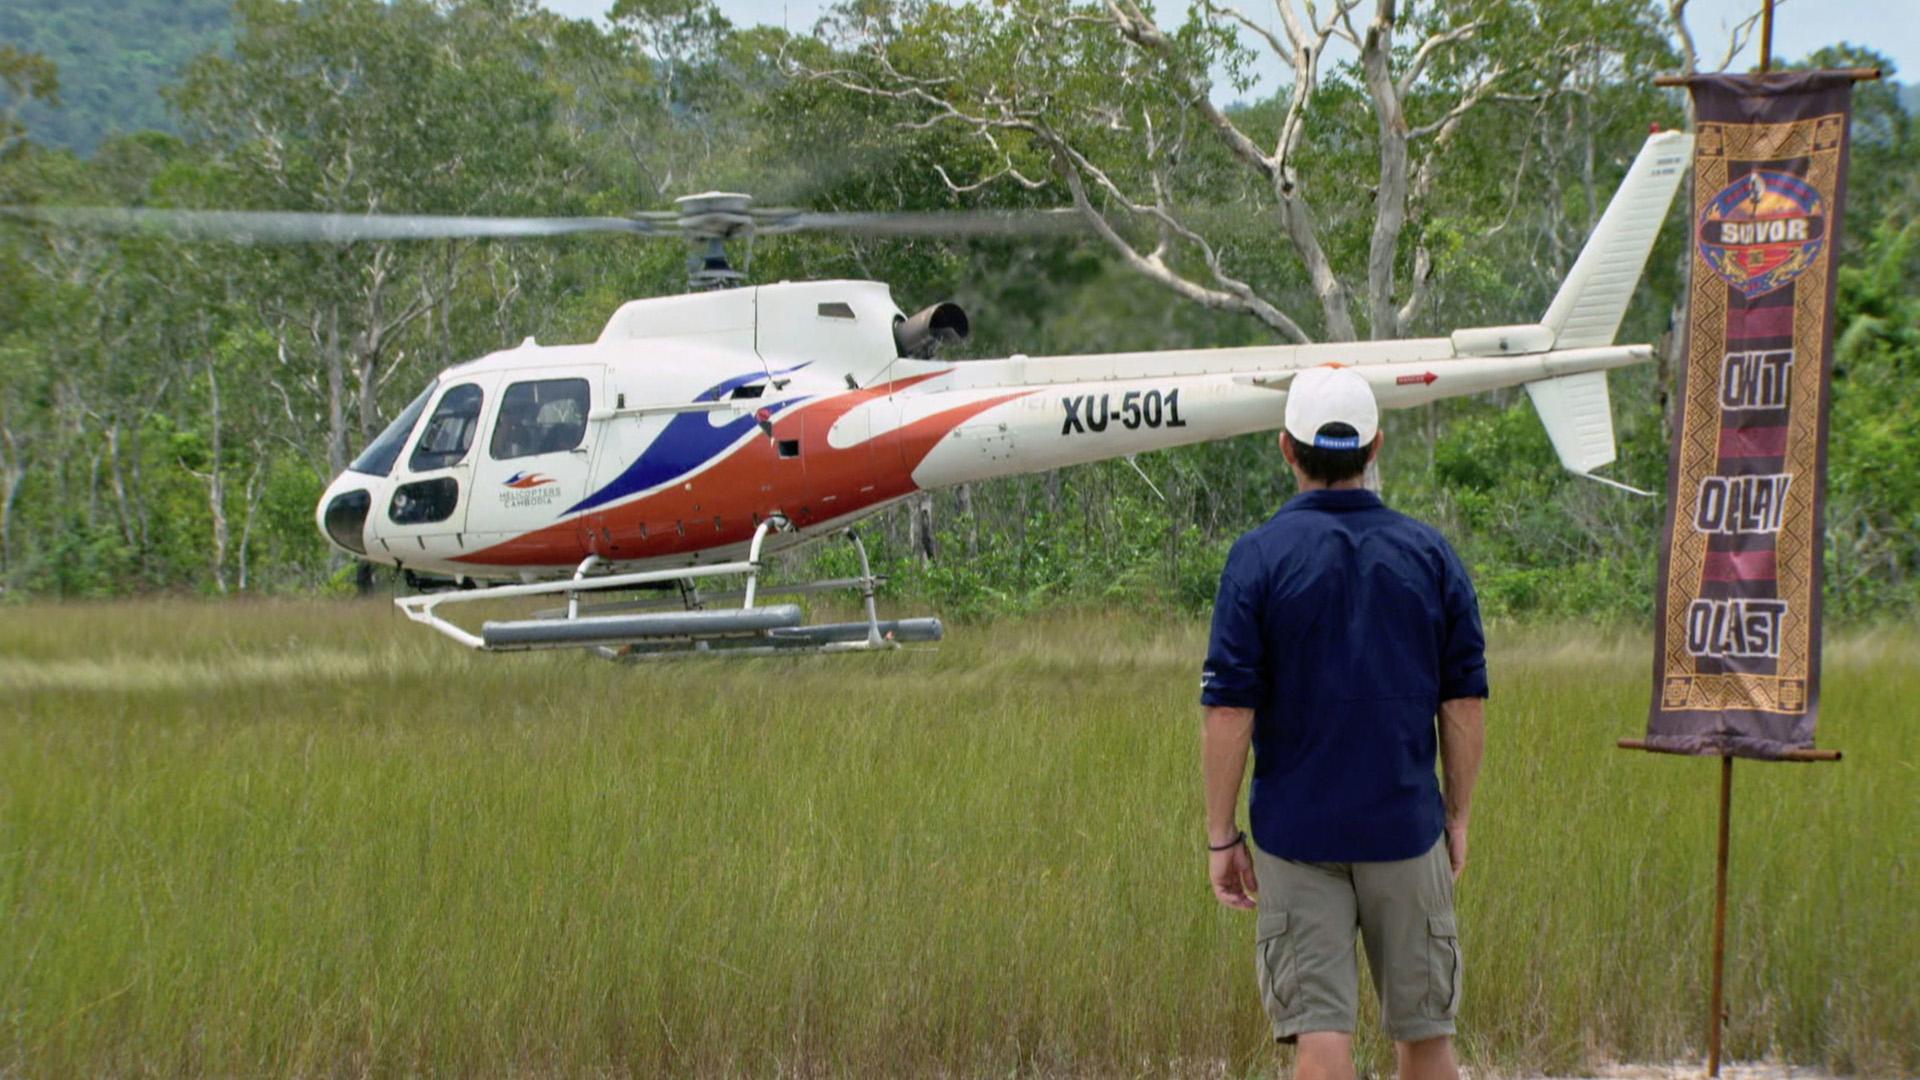 A chopper lands near the Reward Challenge location.